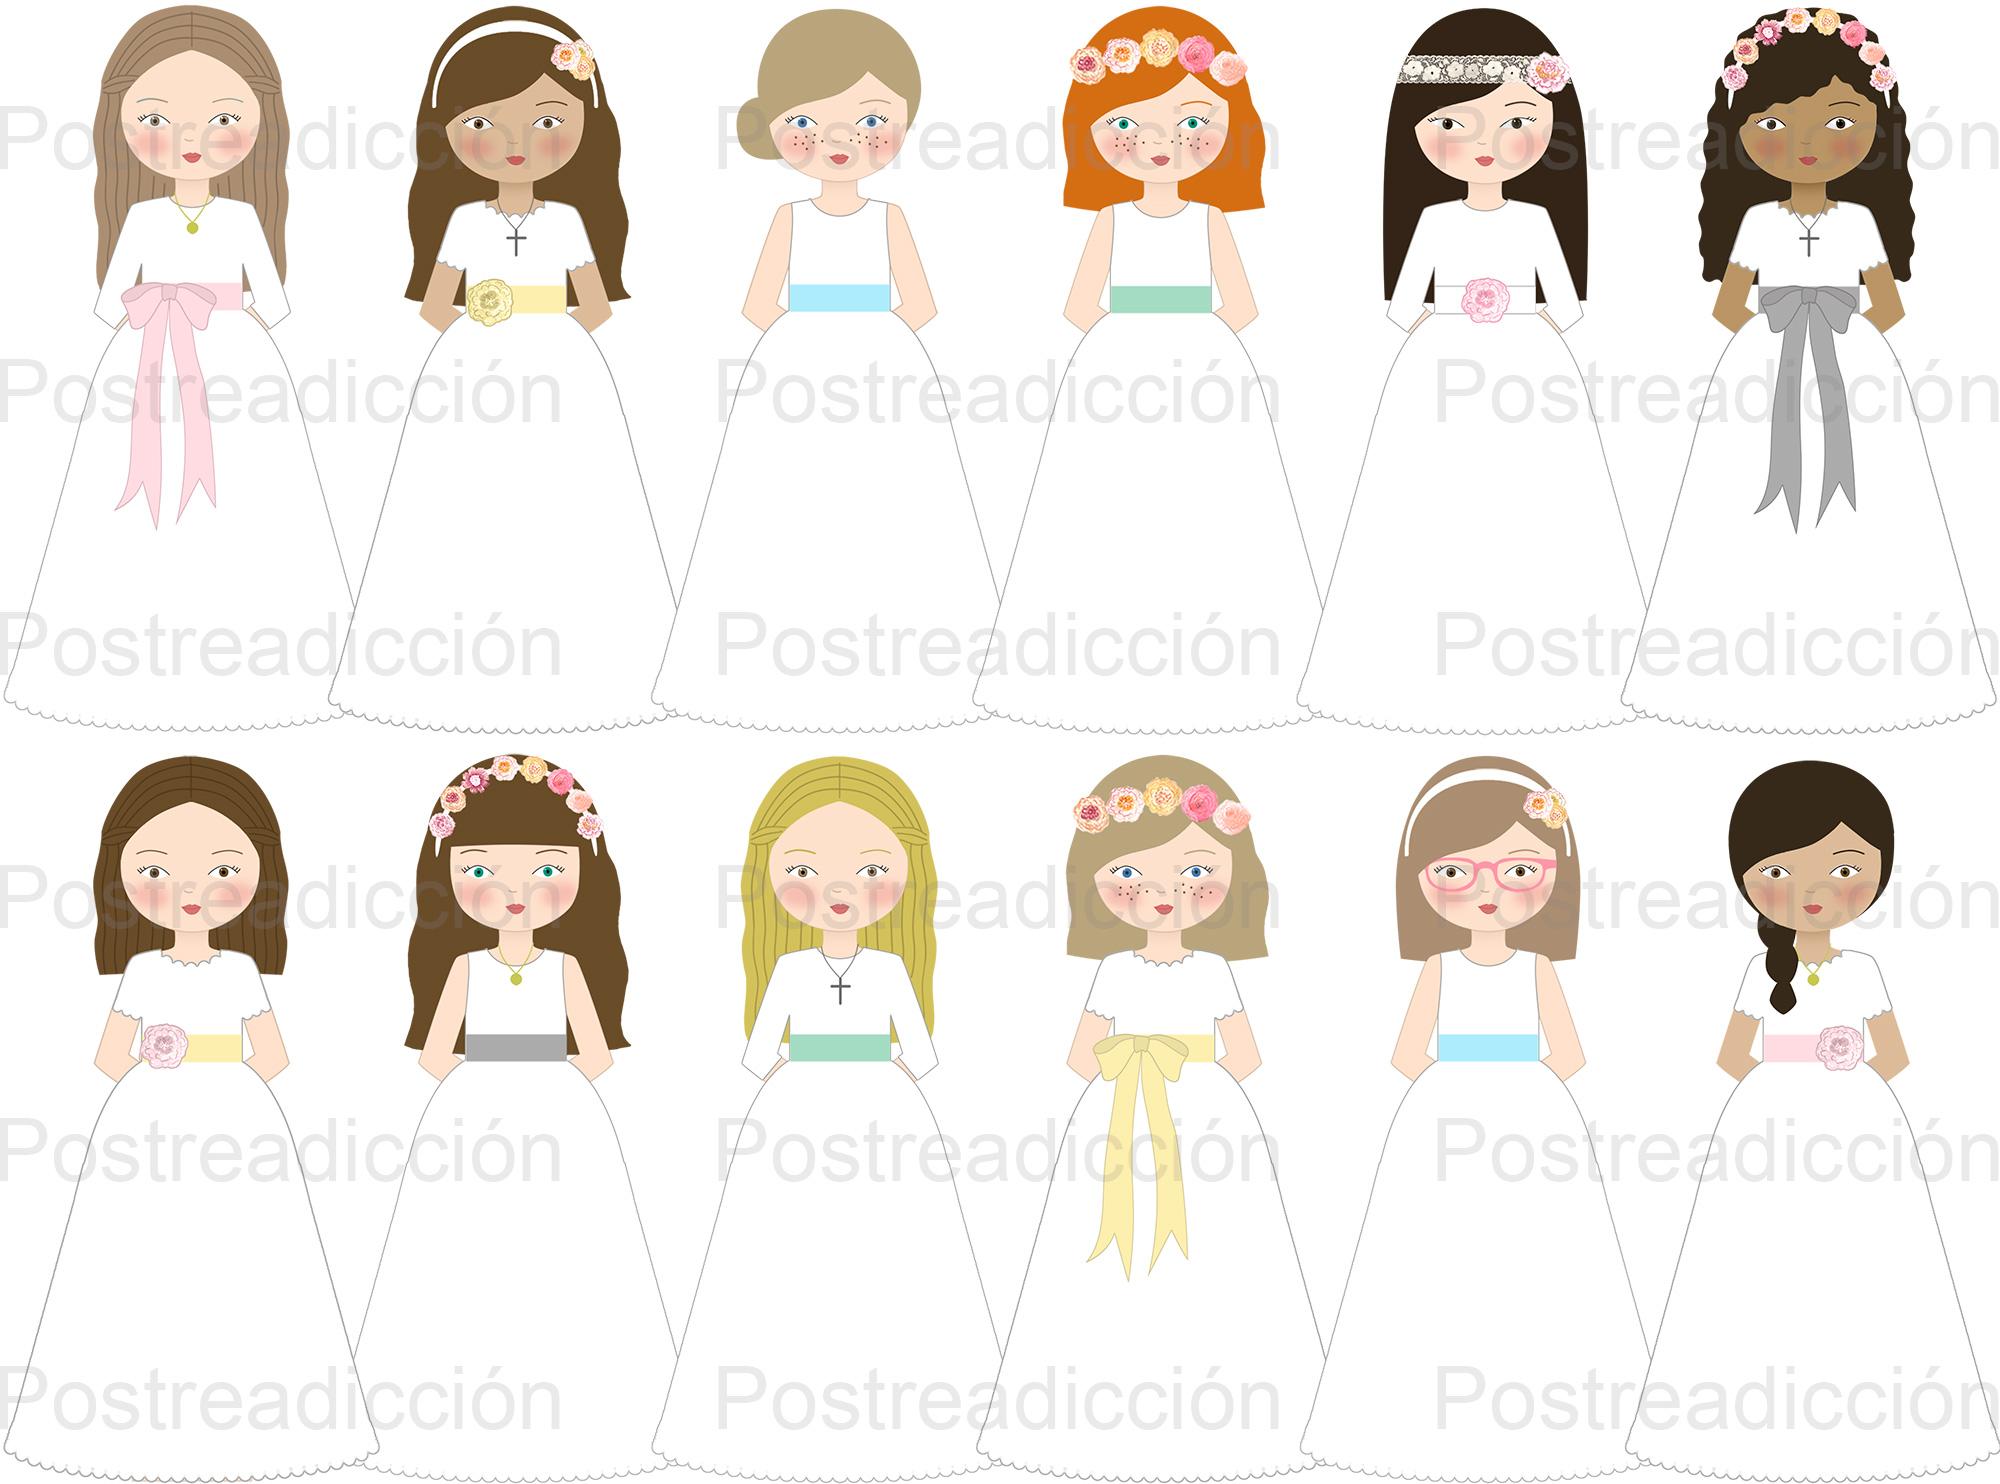 Imagen de producto: https://tienda.postreadiccion.com/img/articulos/secundarias13922-modelo-no-1903-nina-de-comunion-carlota-1.jpg